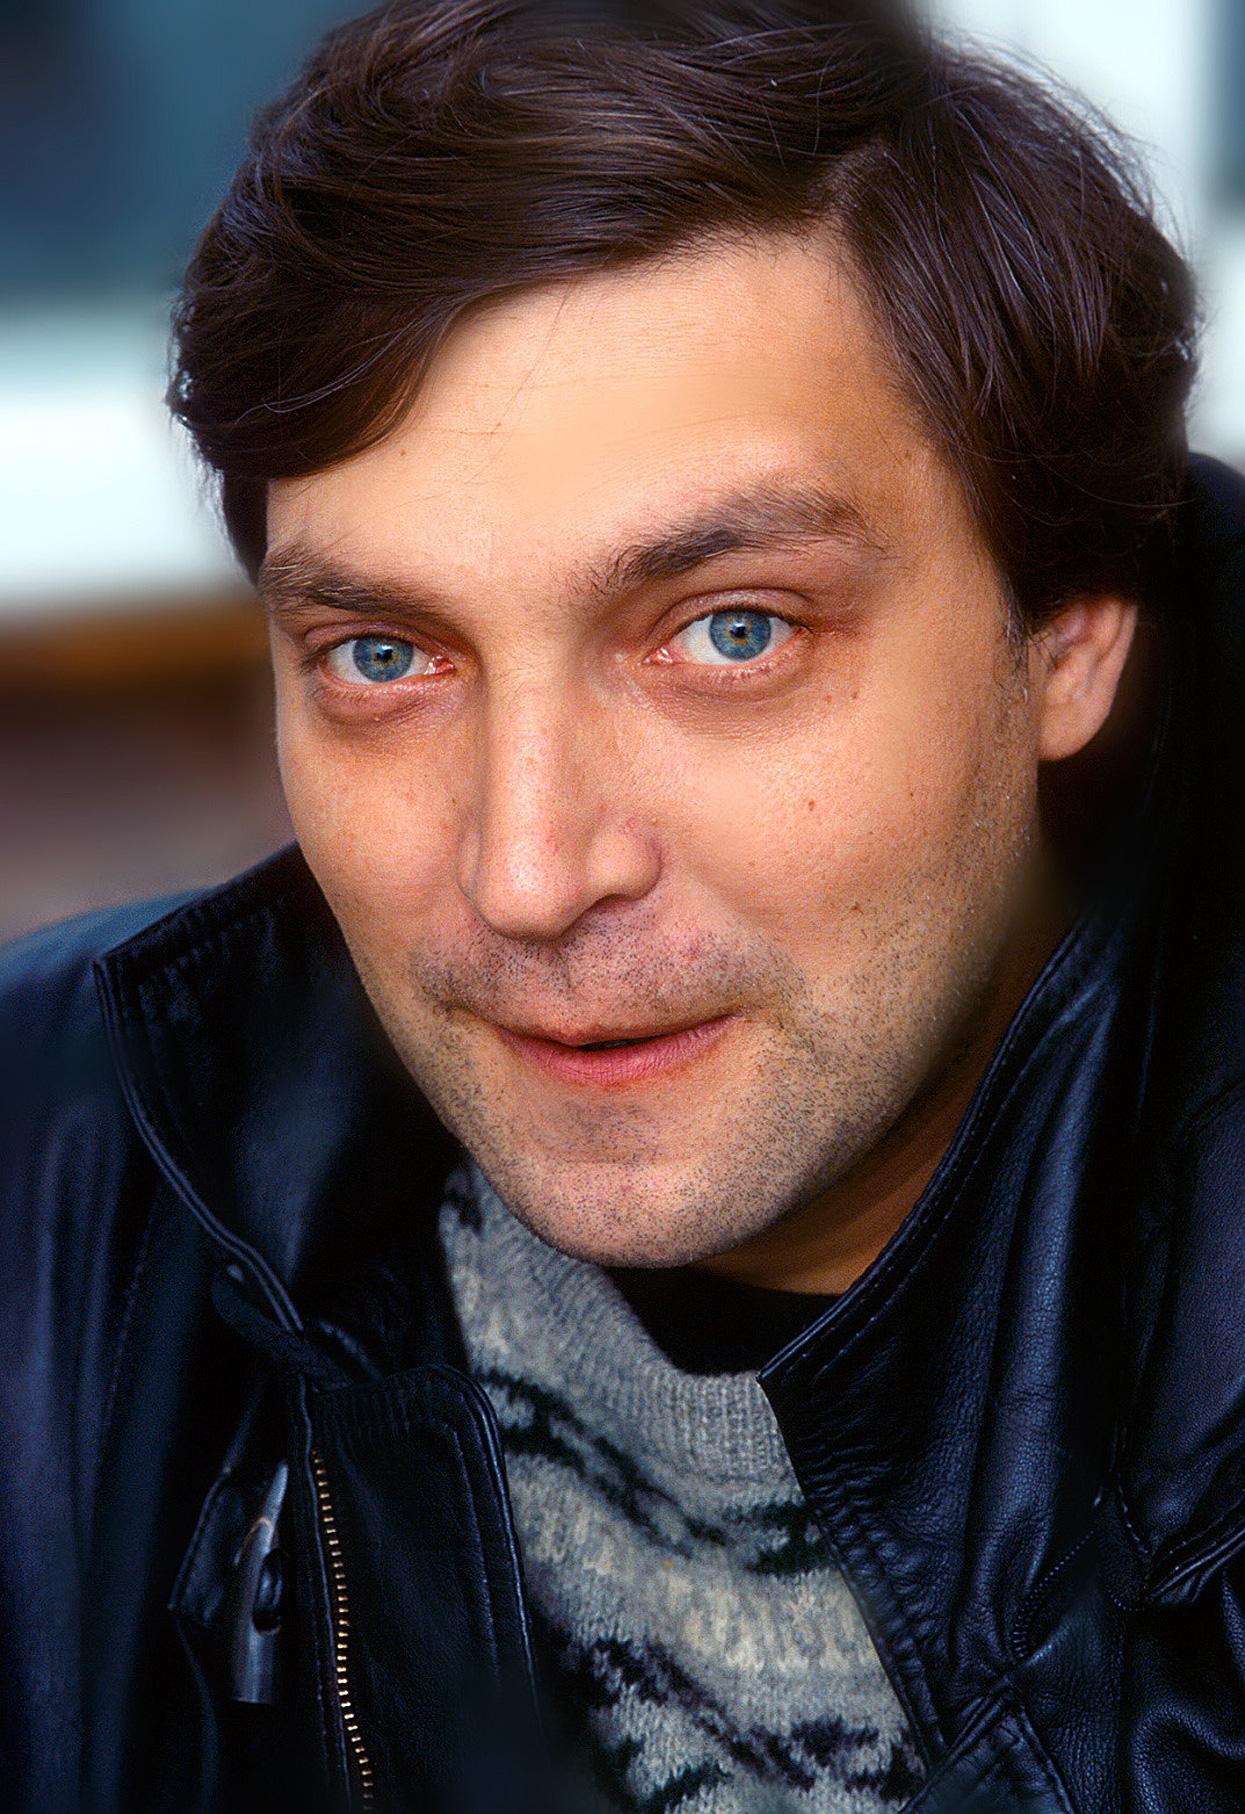 Александр Невзоров. Фото: globallookpress.com